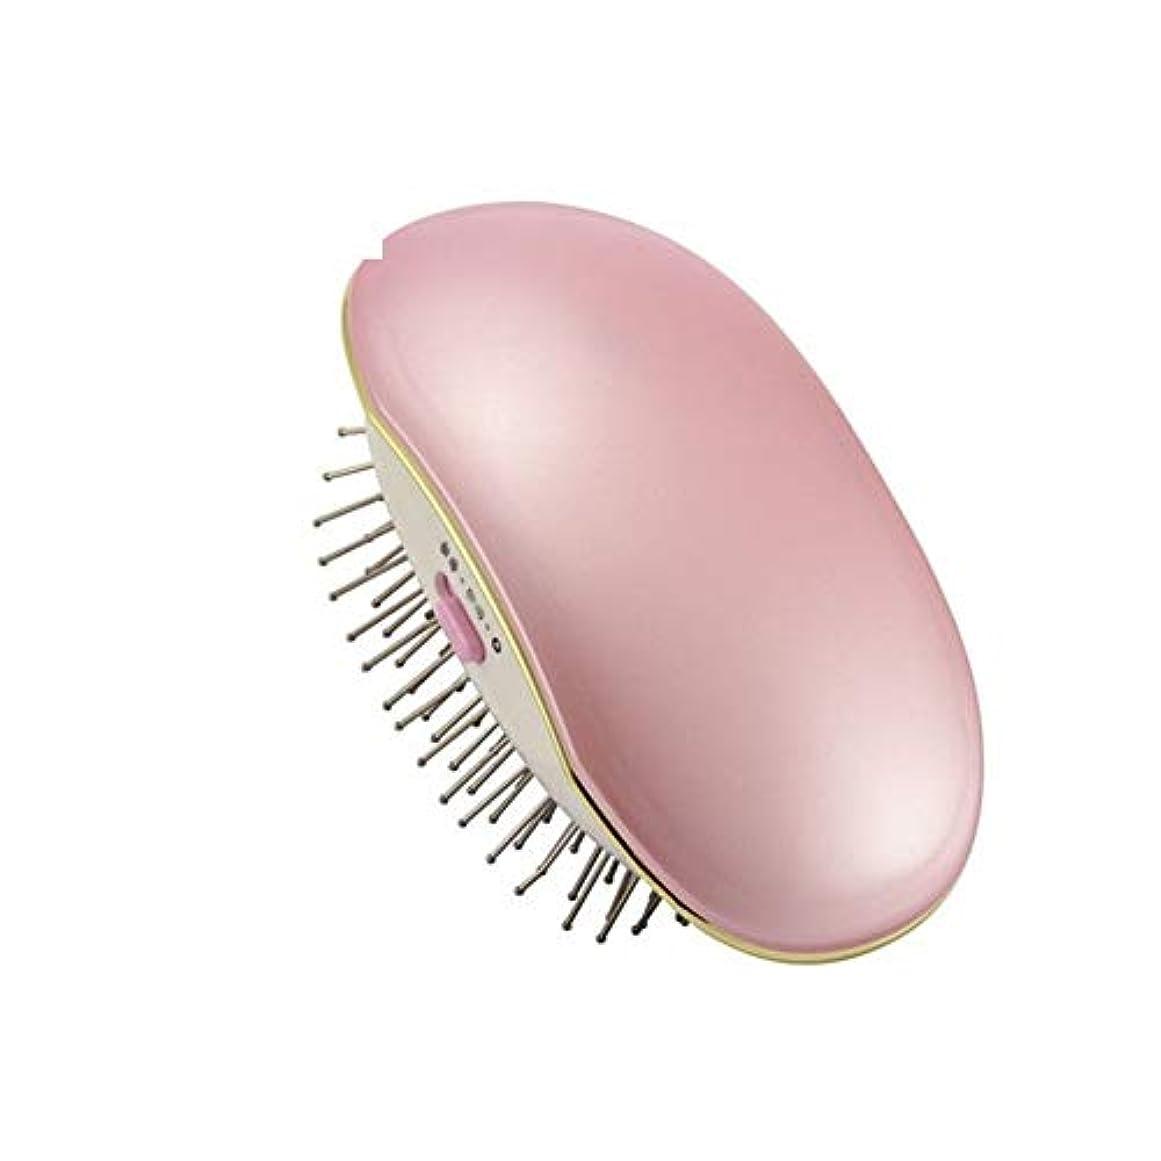 Lizhenhua ポータブル電気イオンブラシ櫛イオン完璧な矯正スタイラーアイロンブラシケア矯正電気アイロンブラシ (Color : Pink)